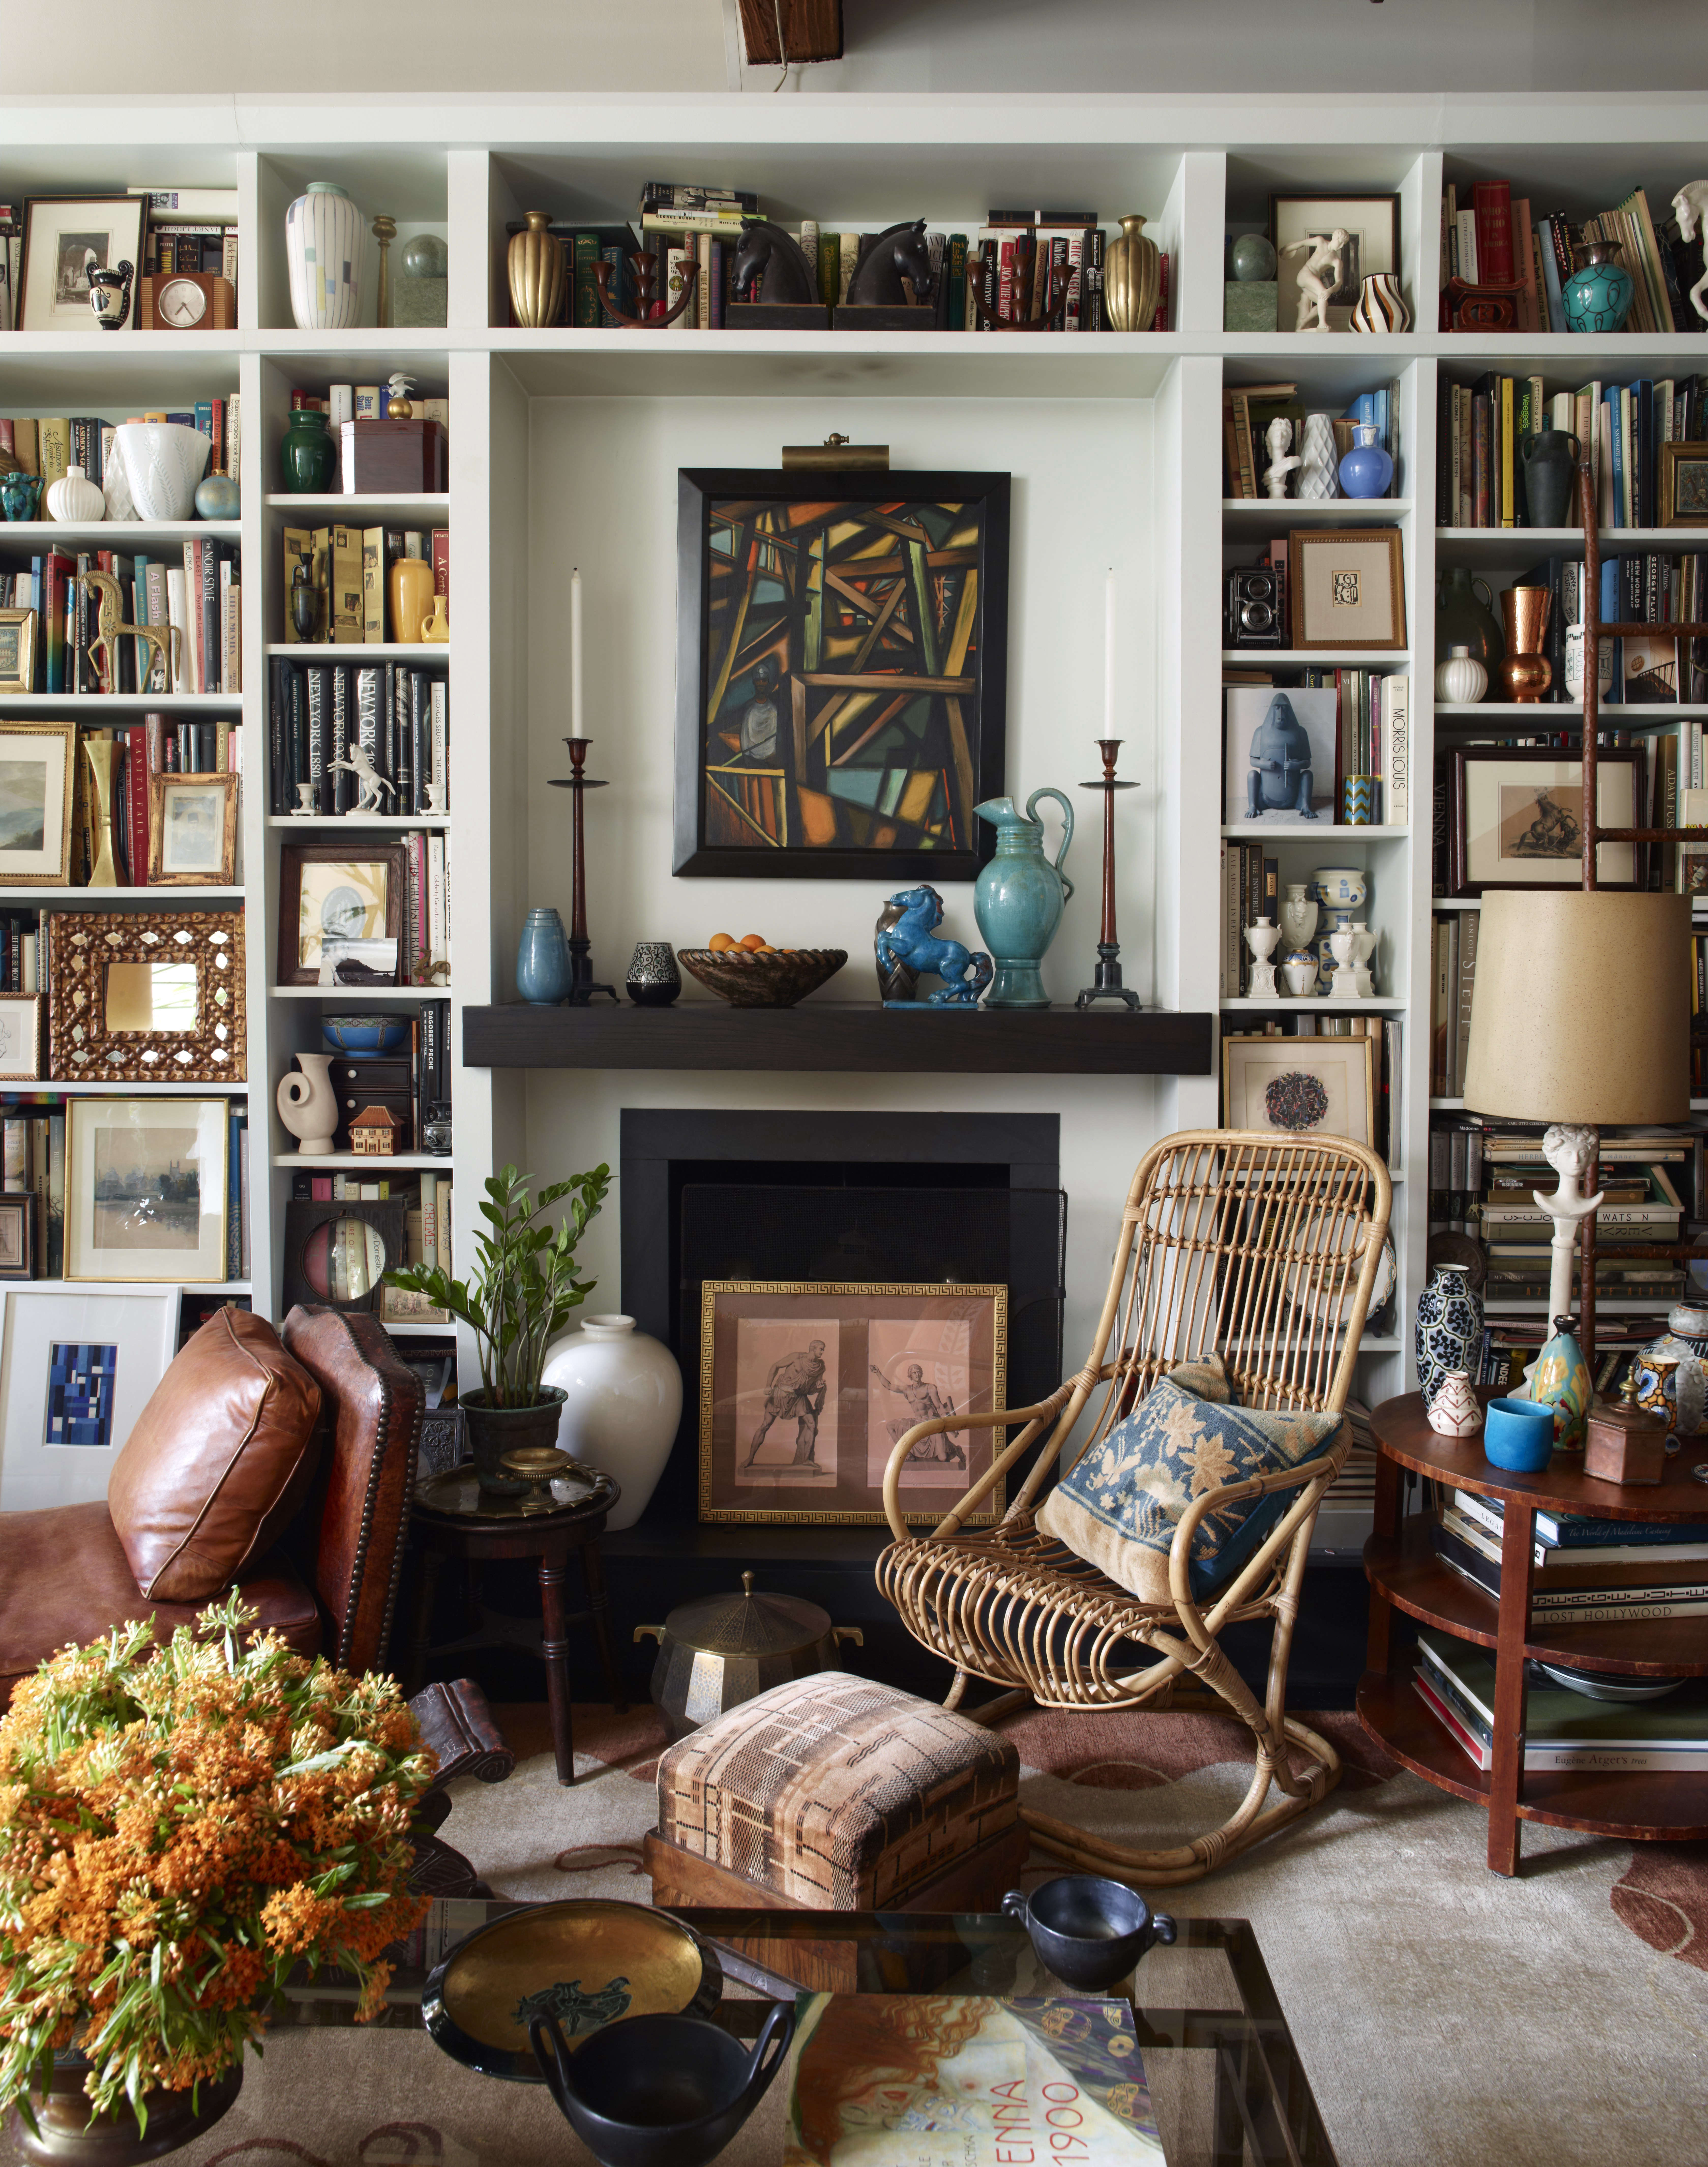 alexandra loew living room artwork books interior design 12